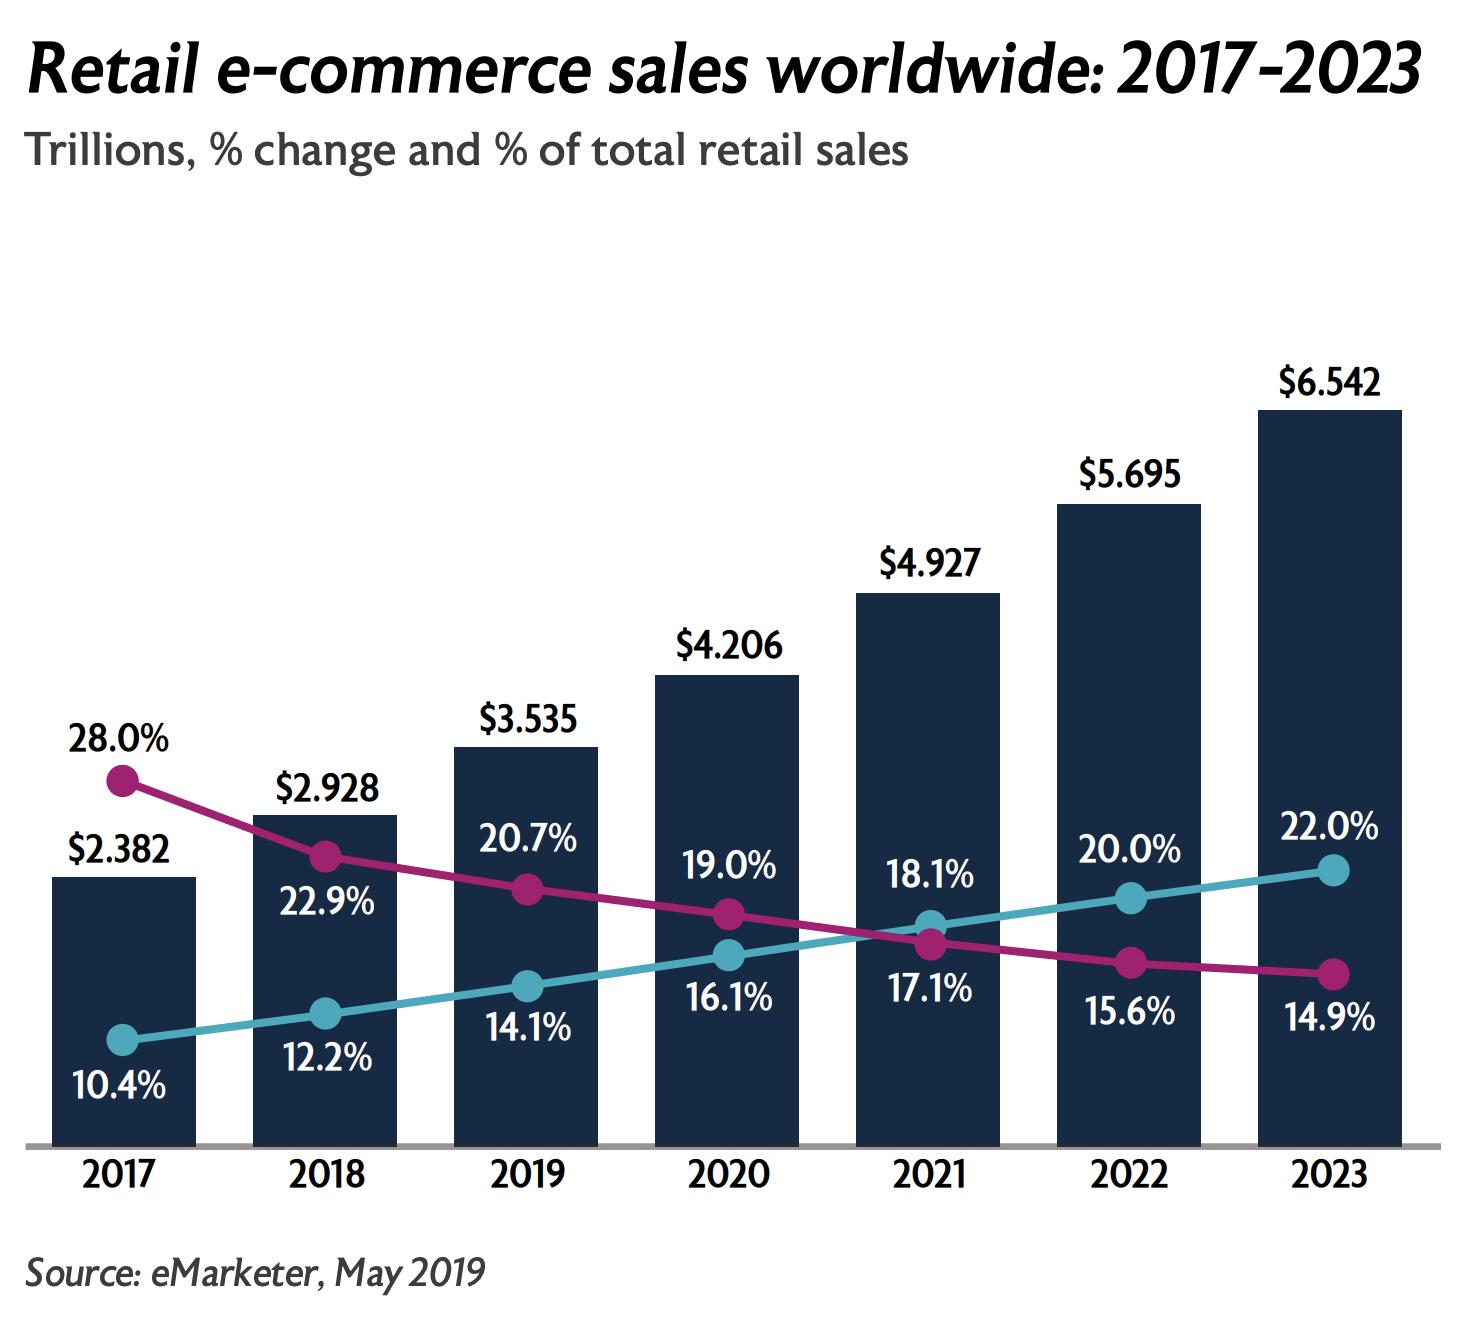 Retail e-commerce sales worldwide, 2017-